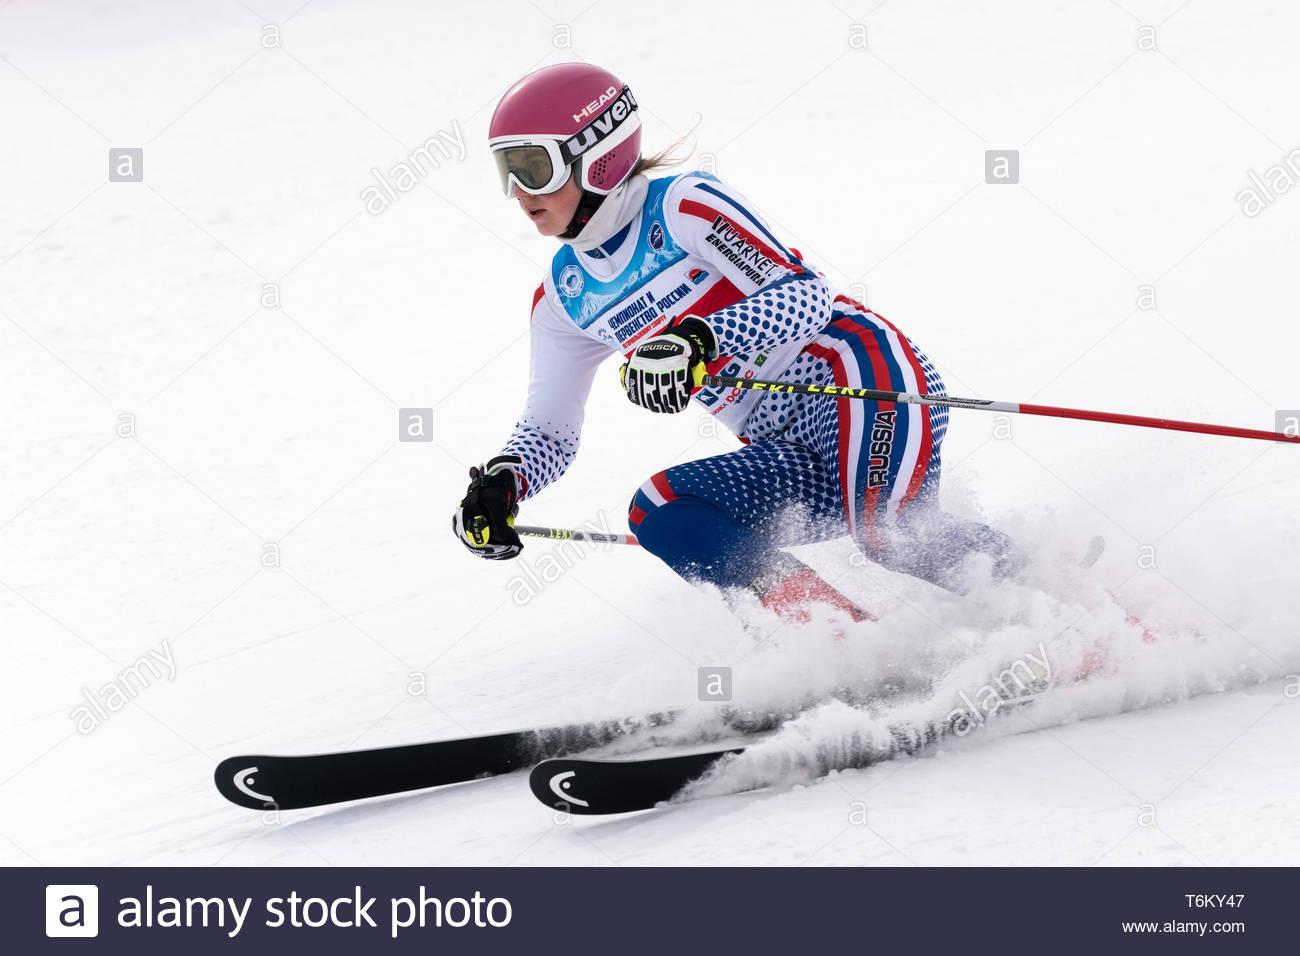 KAMCHATKA PENINSULA, RUSSIA - APRIL 2, 2019: Mountain skier Dariya Kryukova (Chelyabinsk) skiing down mount. International Ski Federation Championship - Stock Image